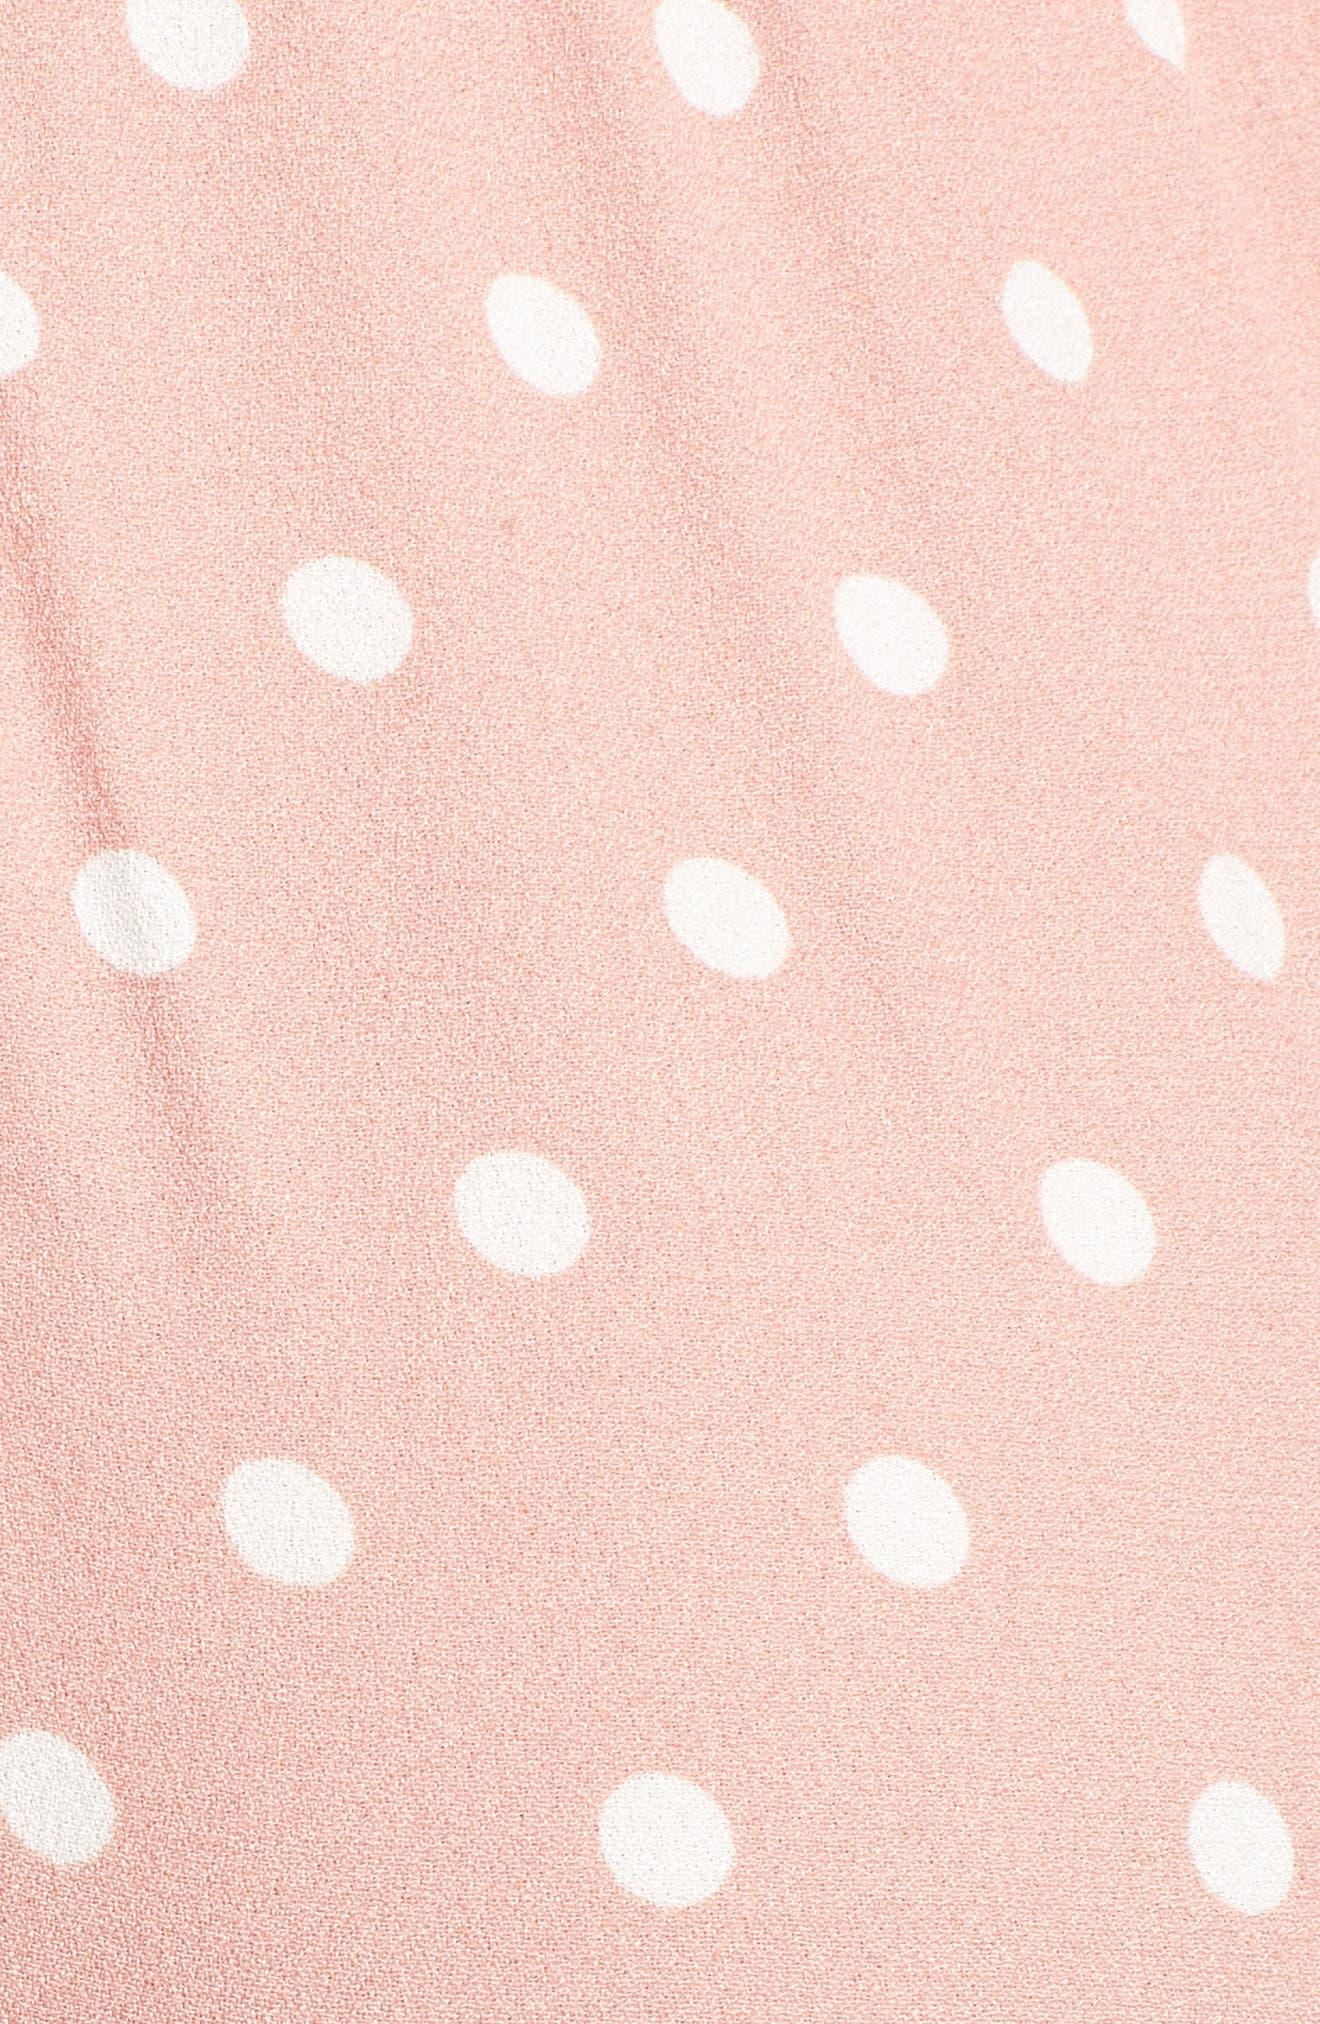 Milan Tie Front Jumpsuit,                             Alternate thumbnail 6, color,                             Misty Rose Polka Dot